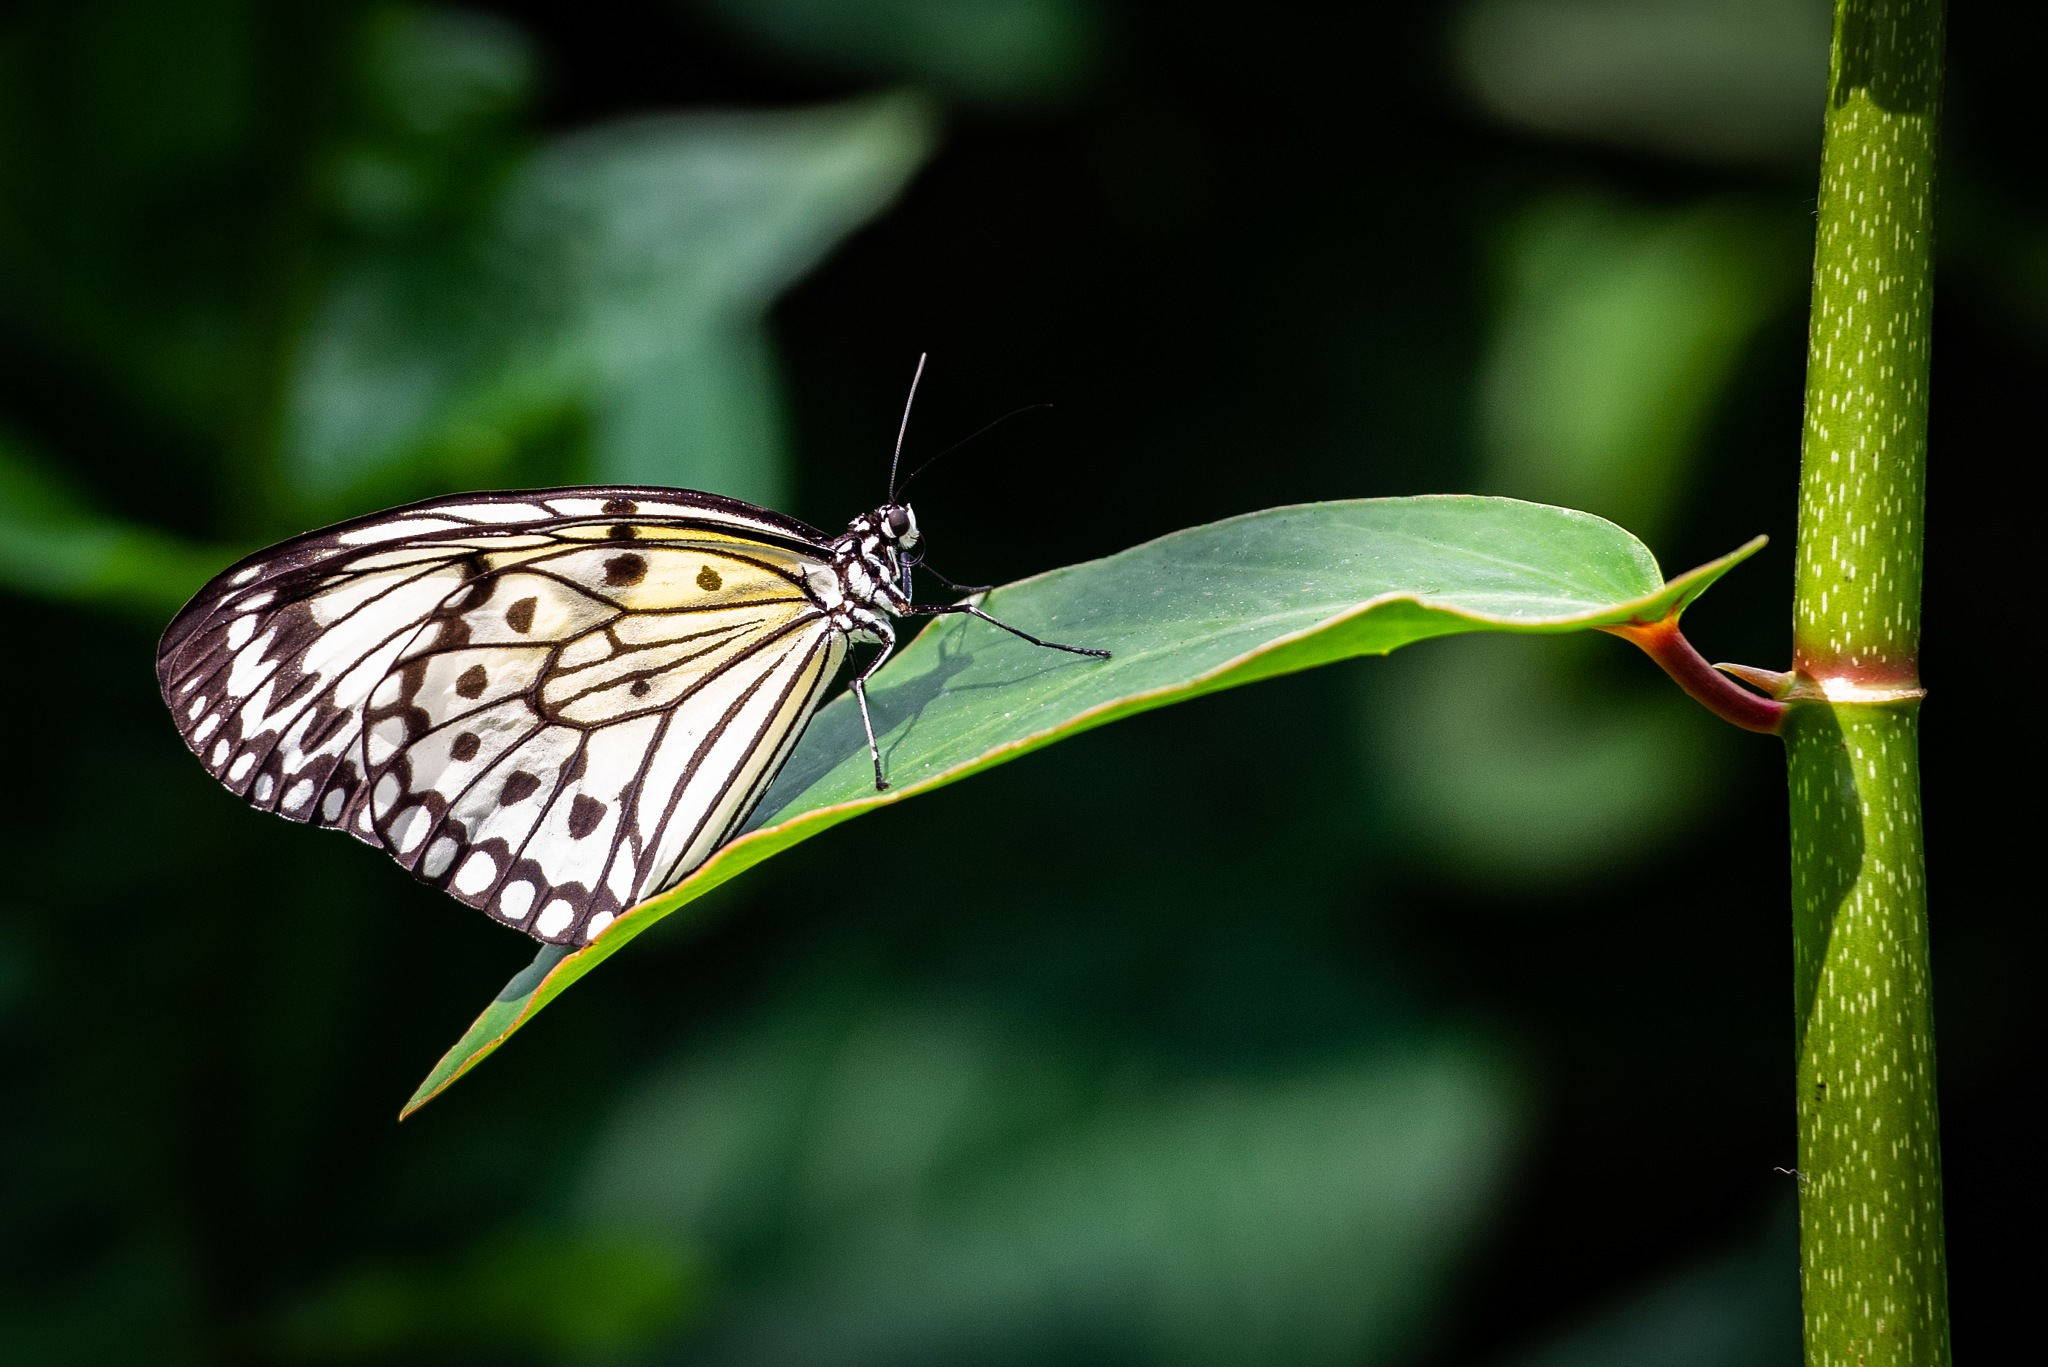 Butterfly 03 by LancePangborn